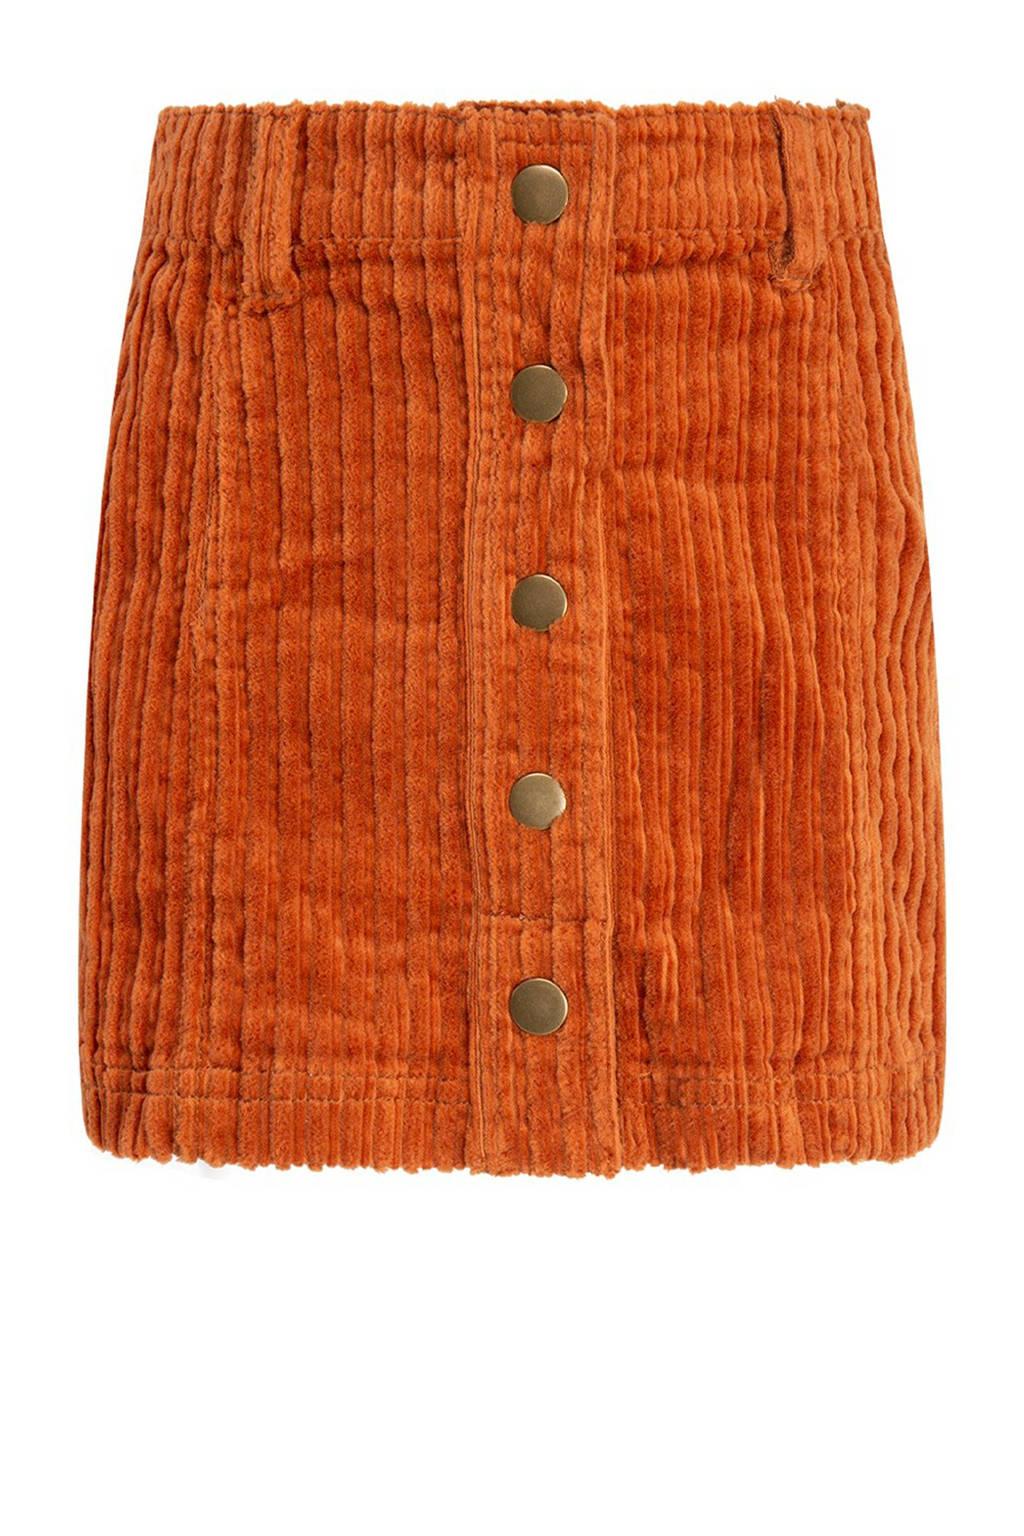 CKS KIDS rok Zuroy met textuur oranje, Oranje